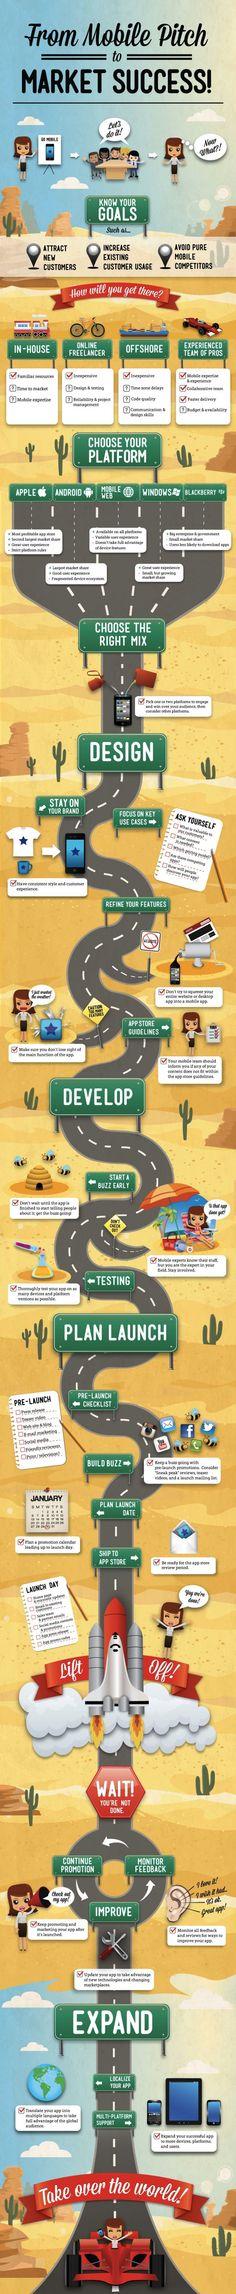 #Mobile_application_development